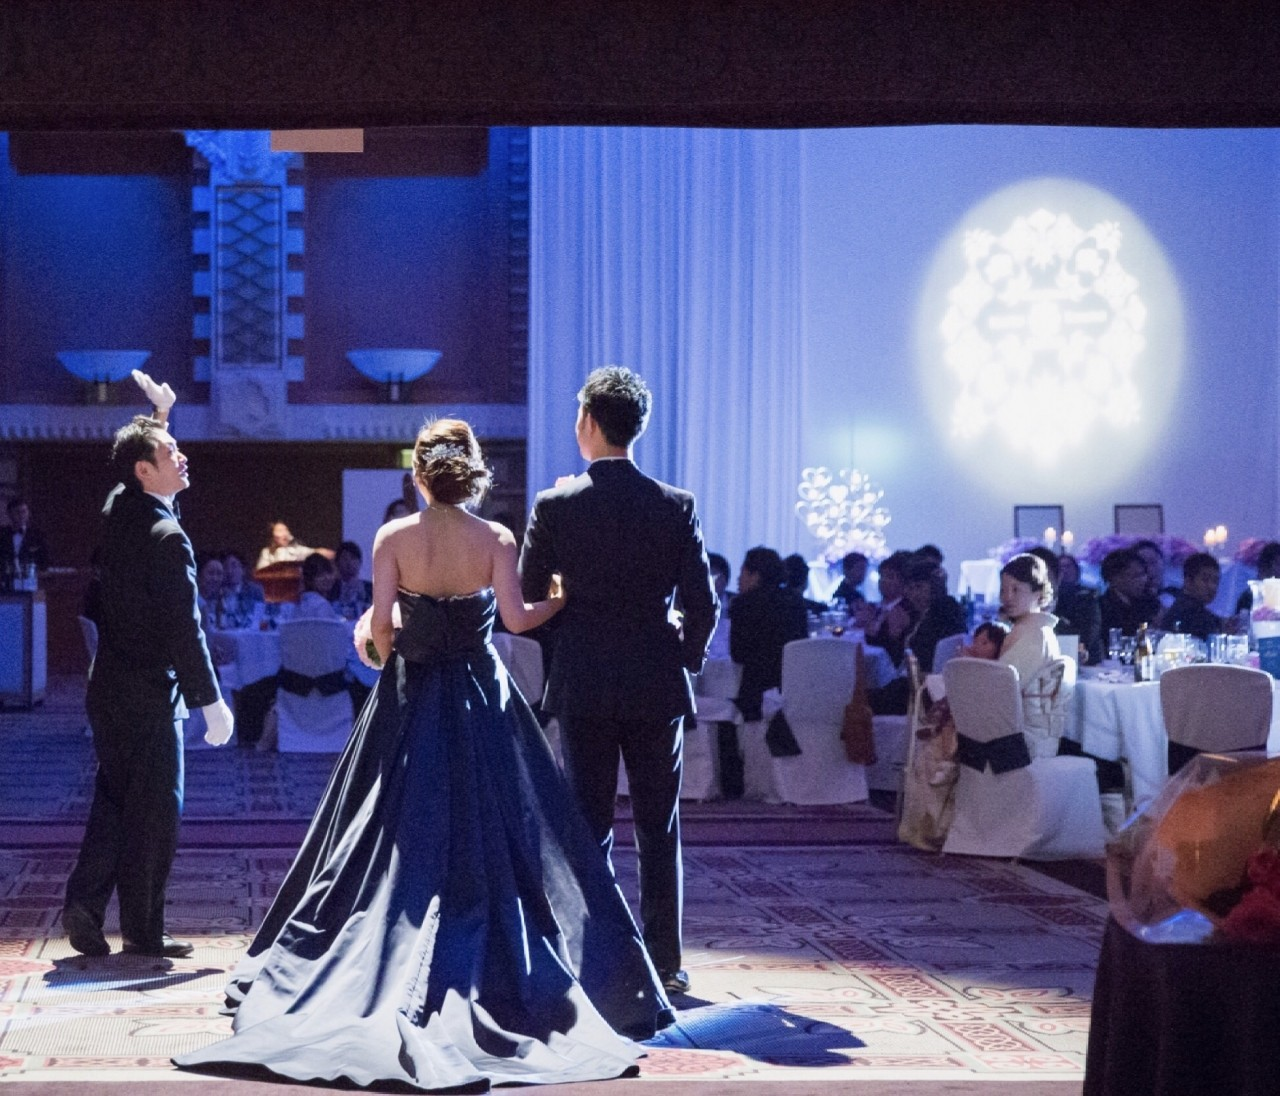 【Wedding】婚BAILAが付録のBAILA7月号の魅力